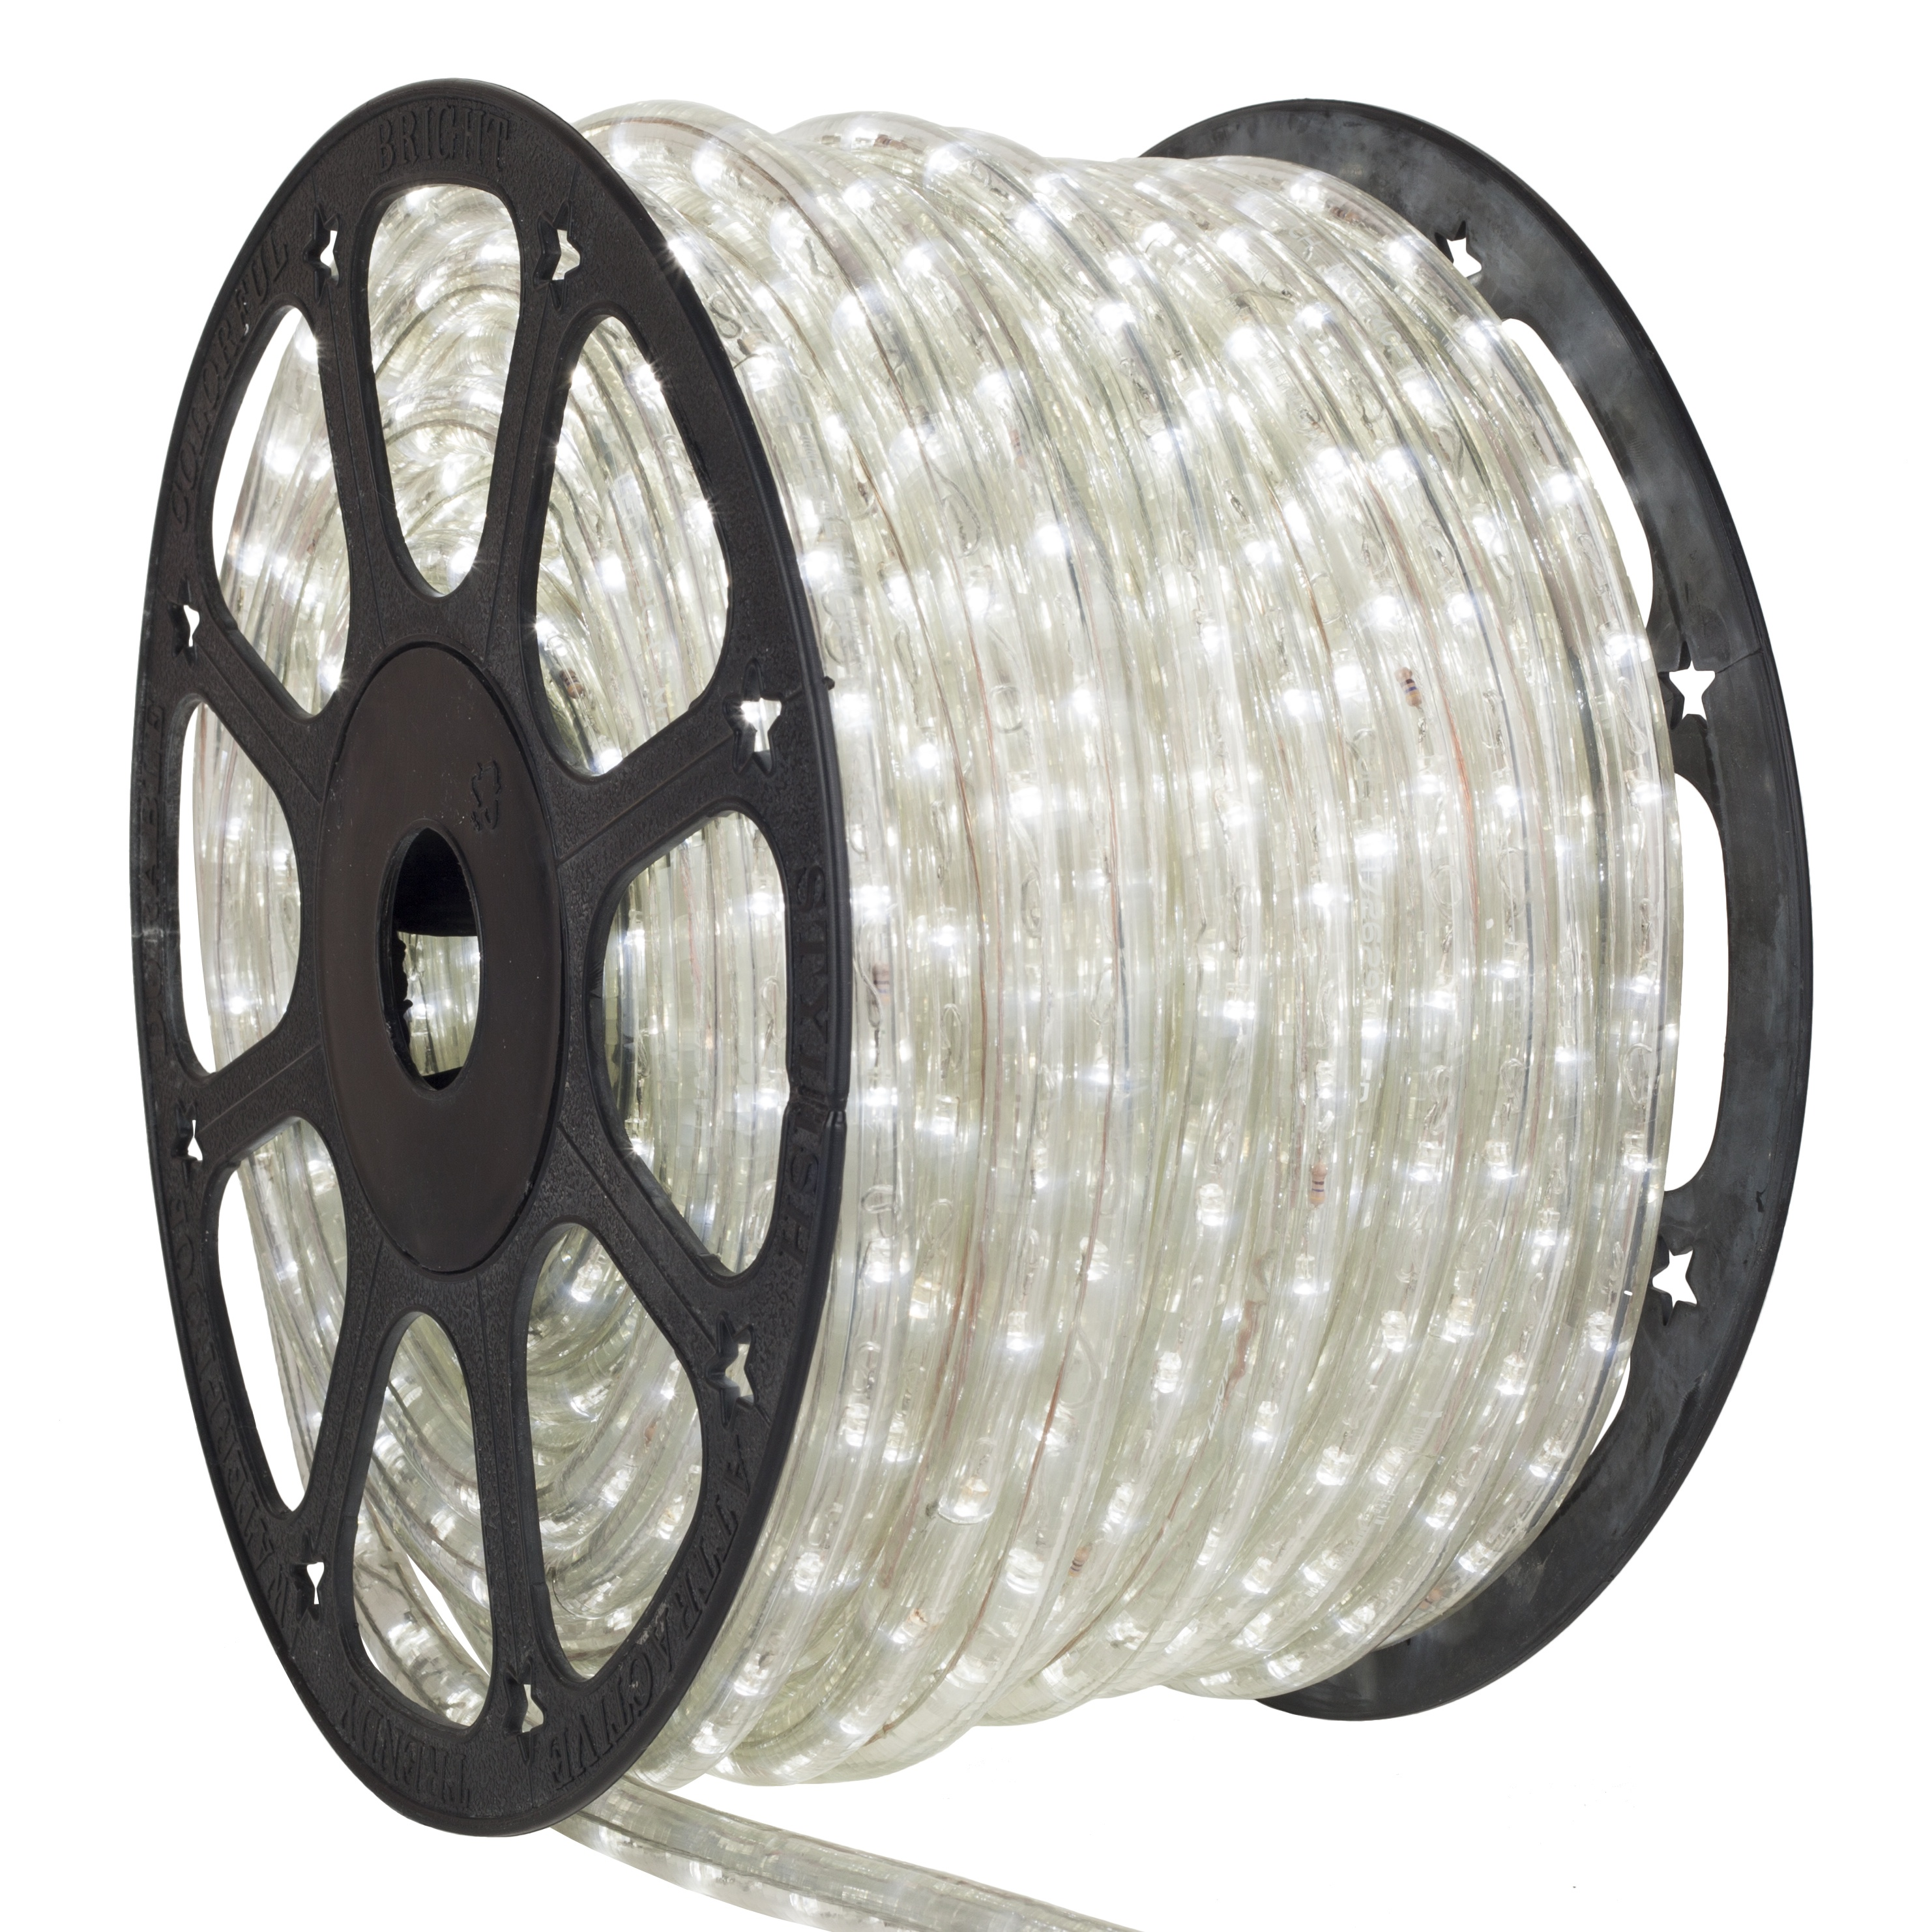 White Rope Lights